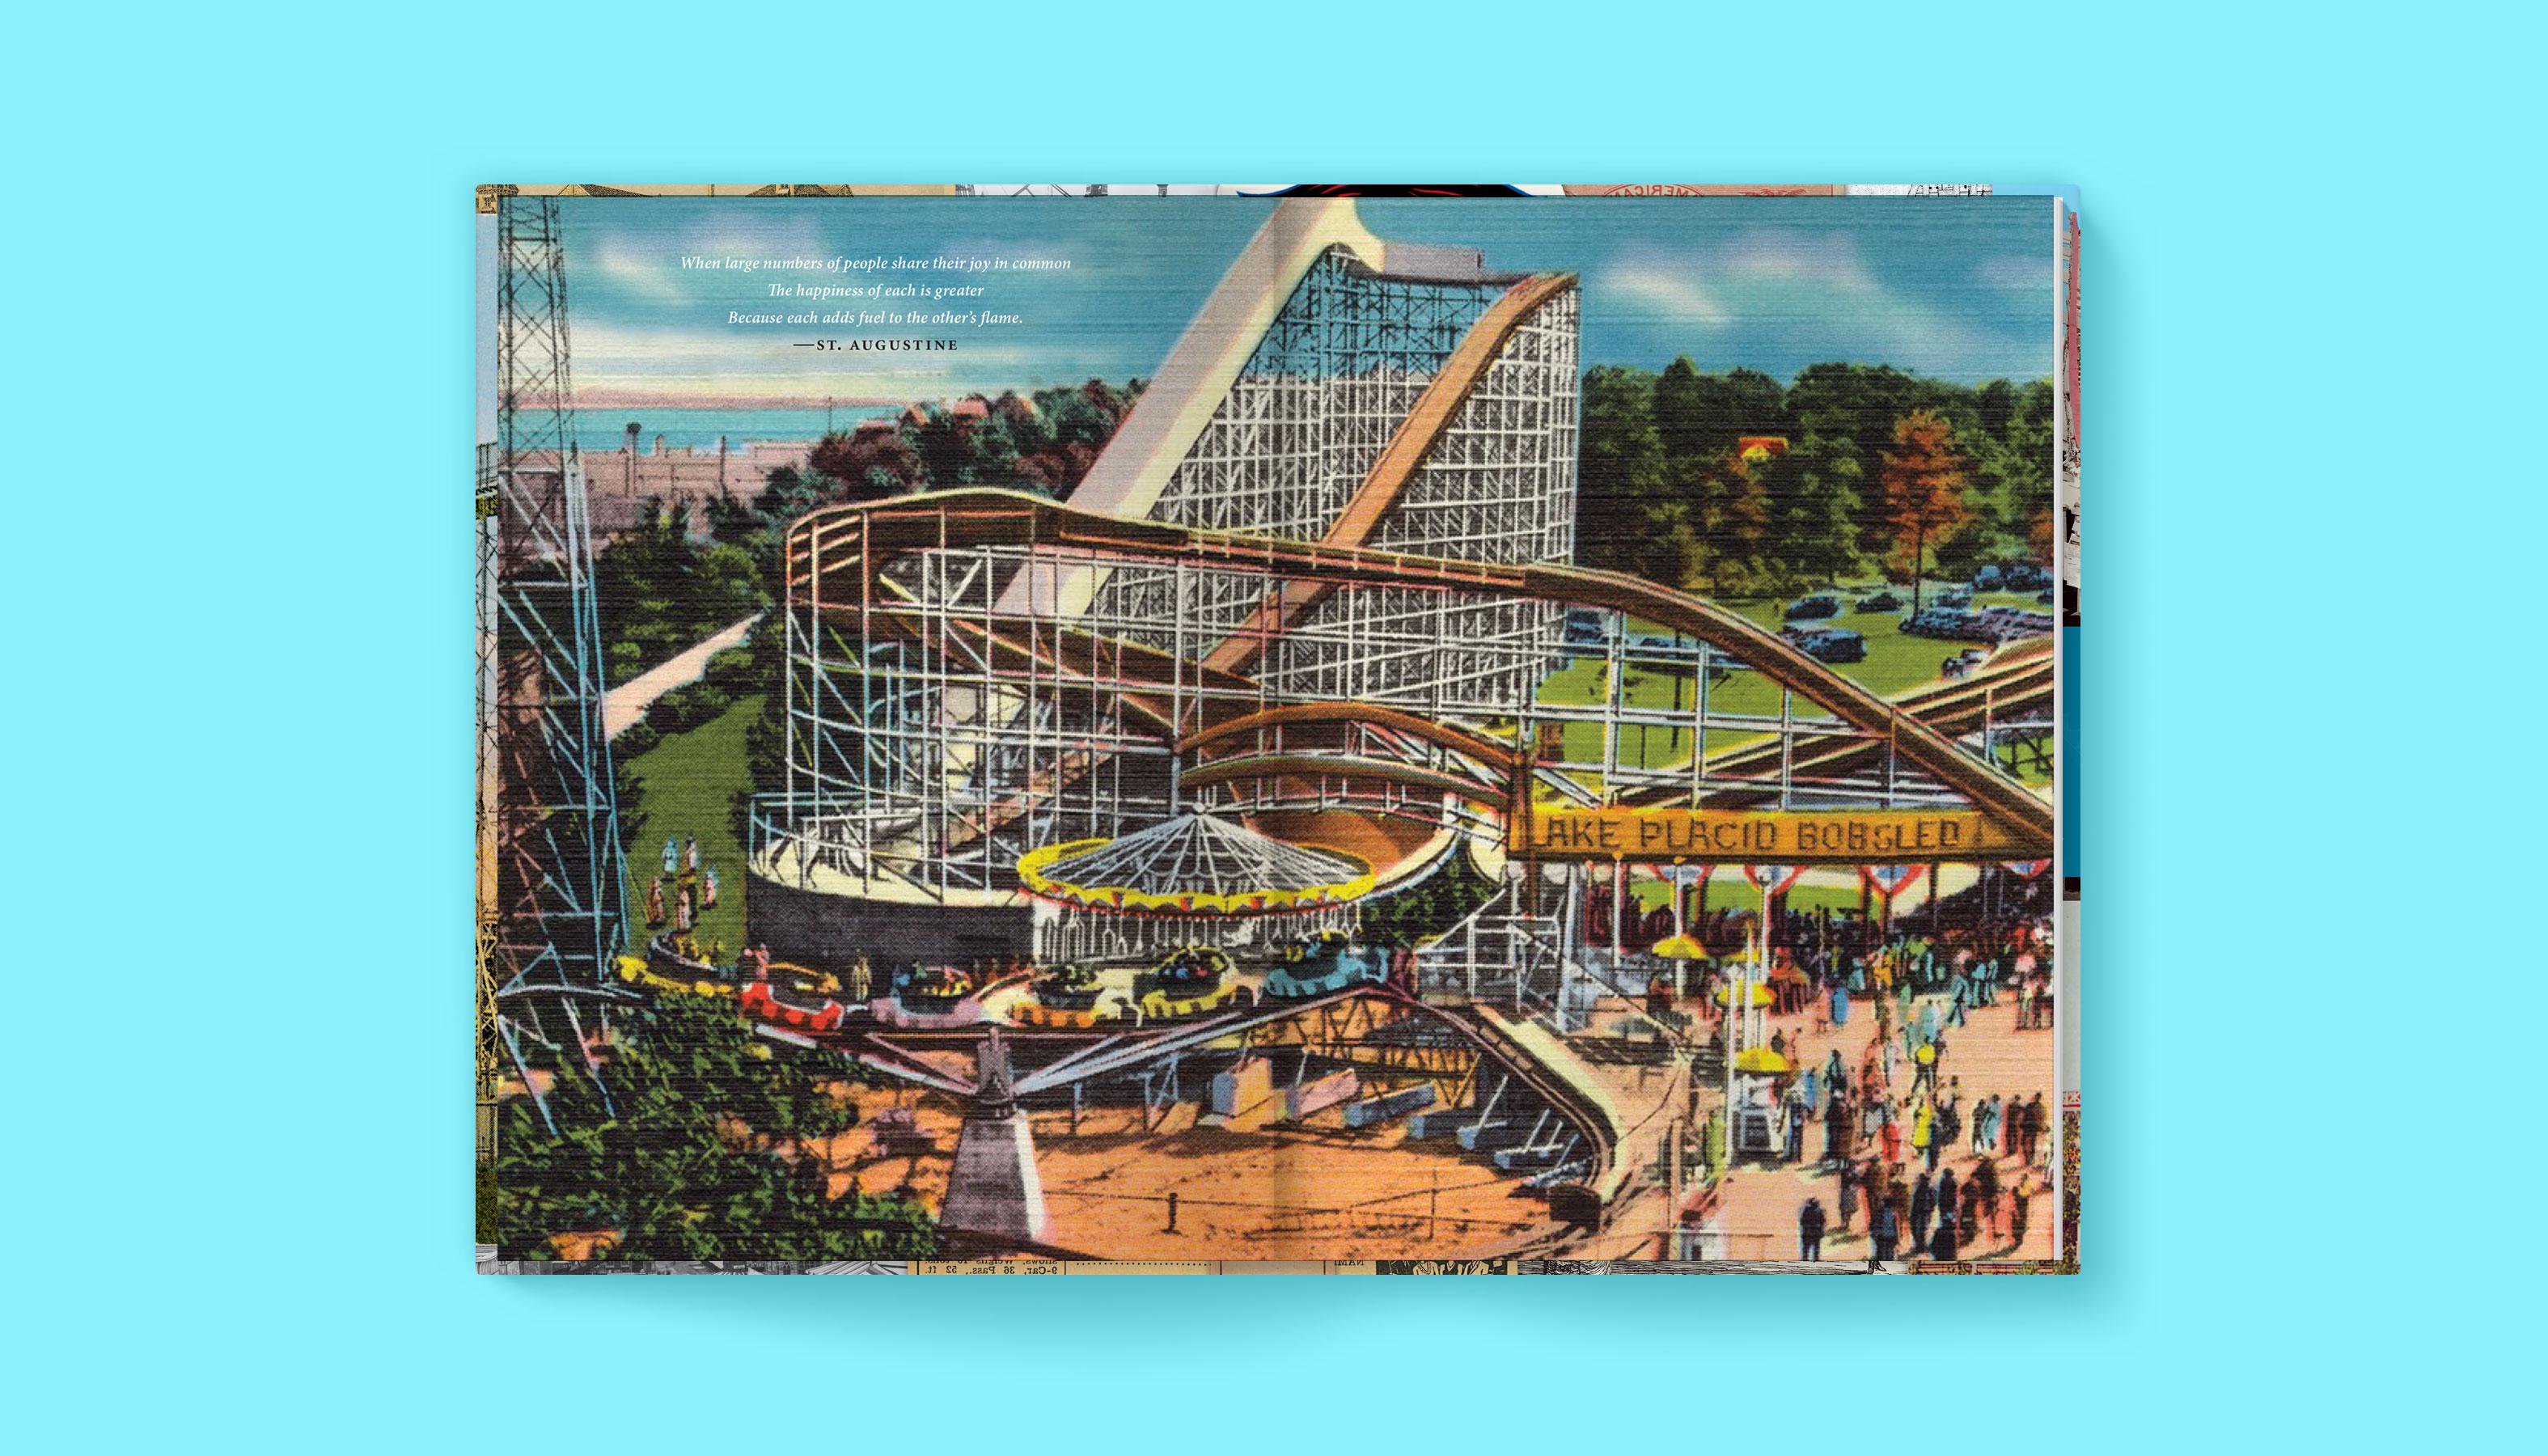 The Amusement Park interior 4